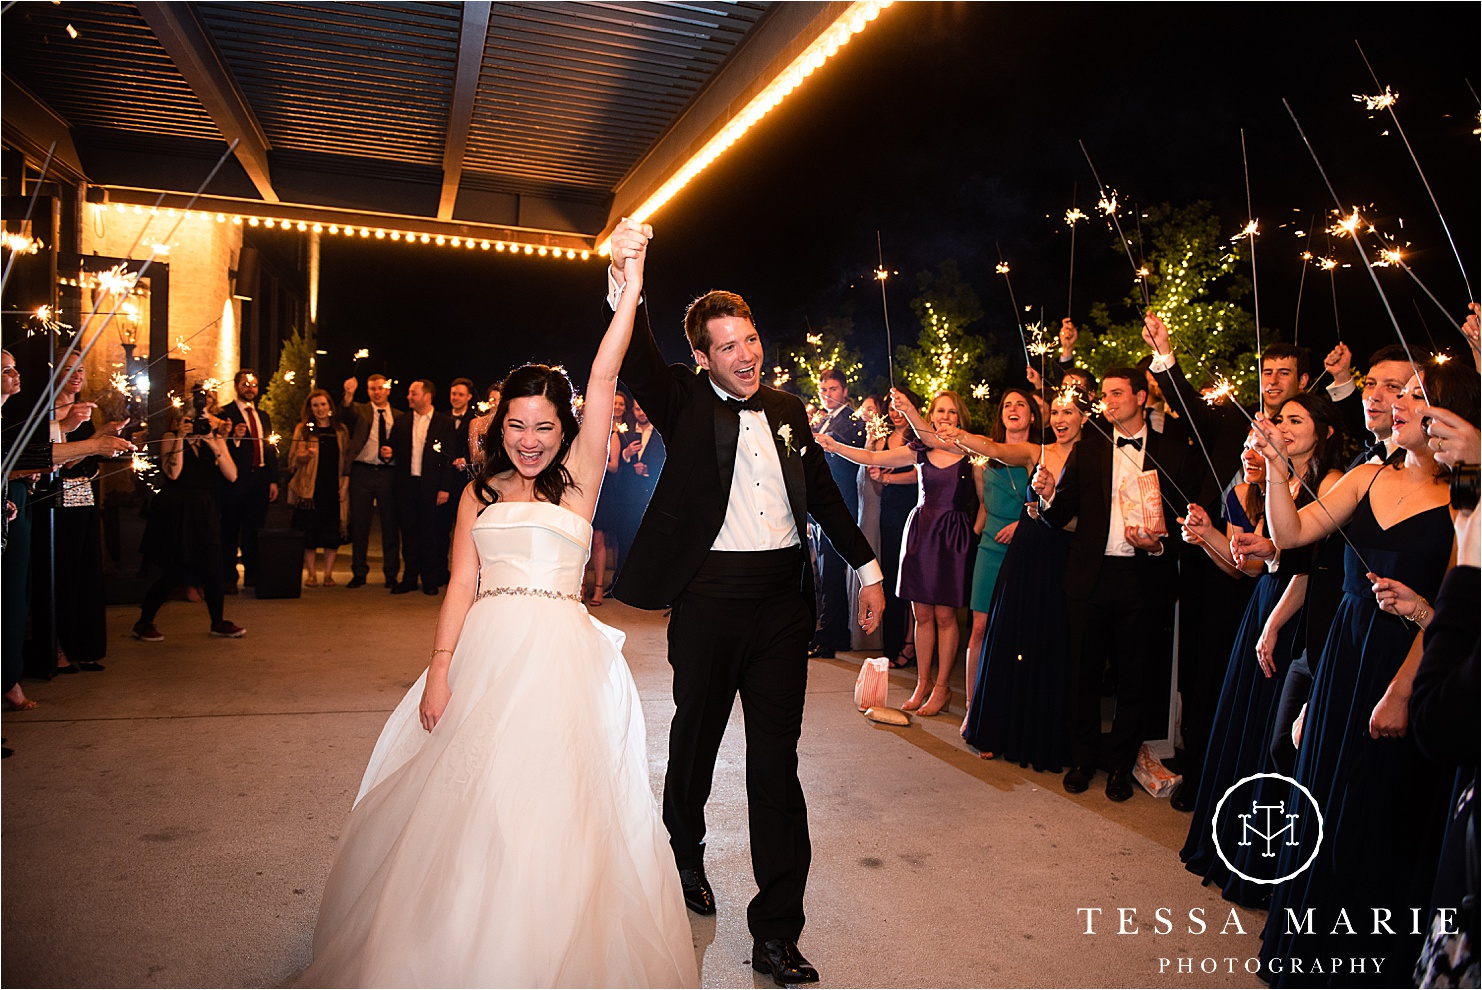 Tessa_marie_weddings_houston_wedding_photographer_The_astorian_0188.jpg